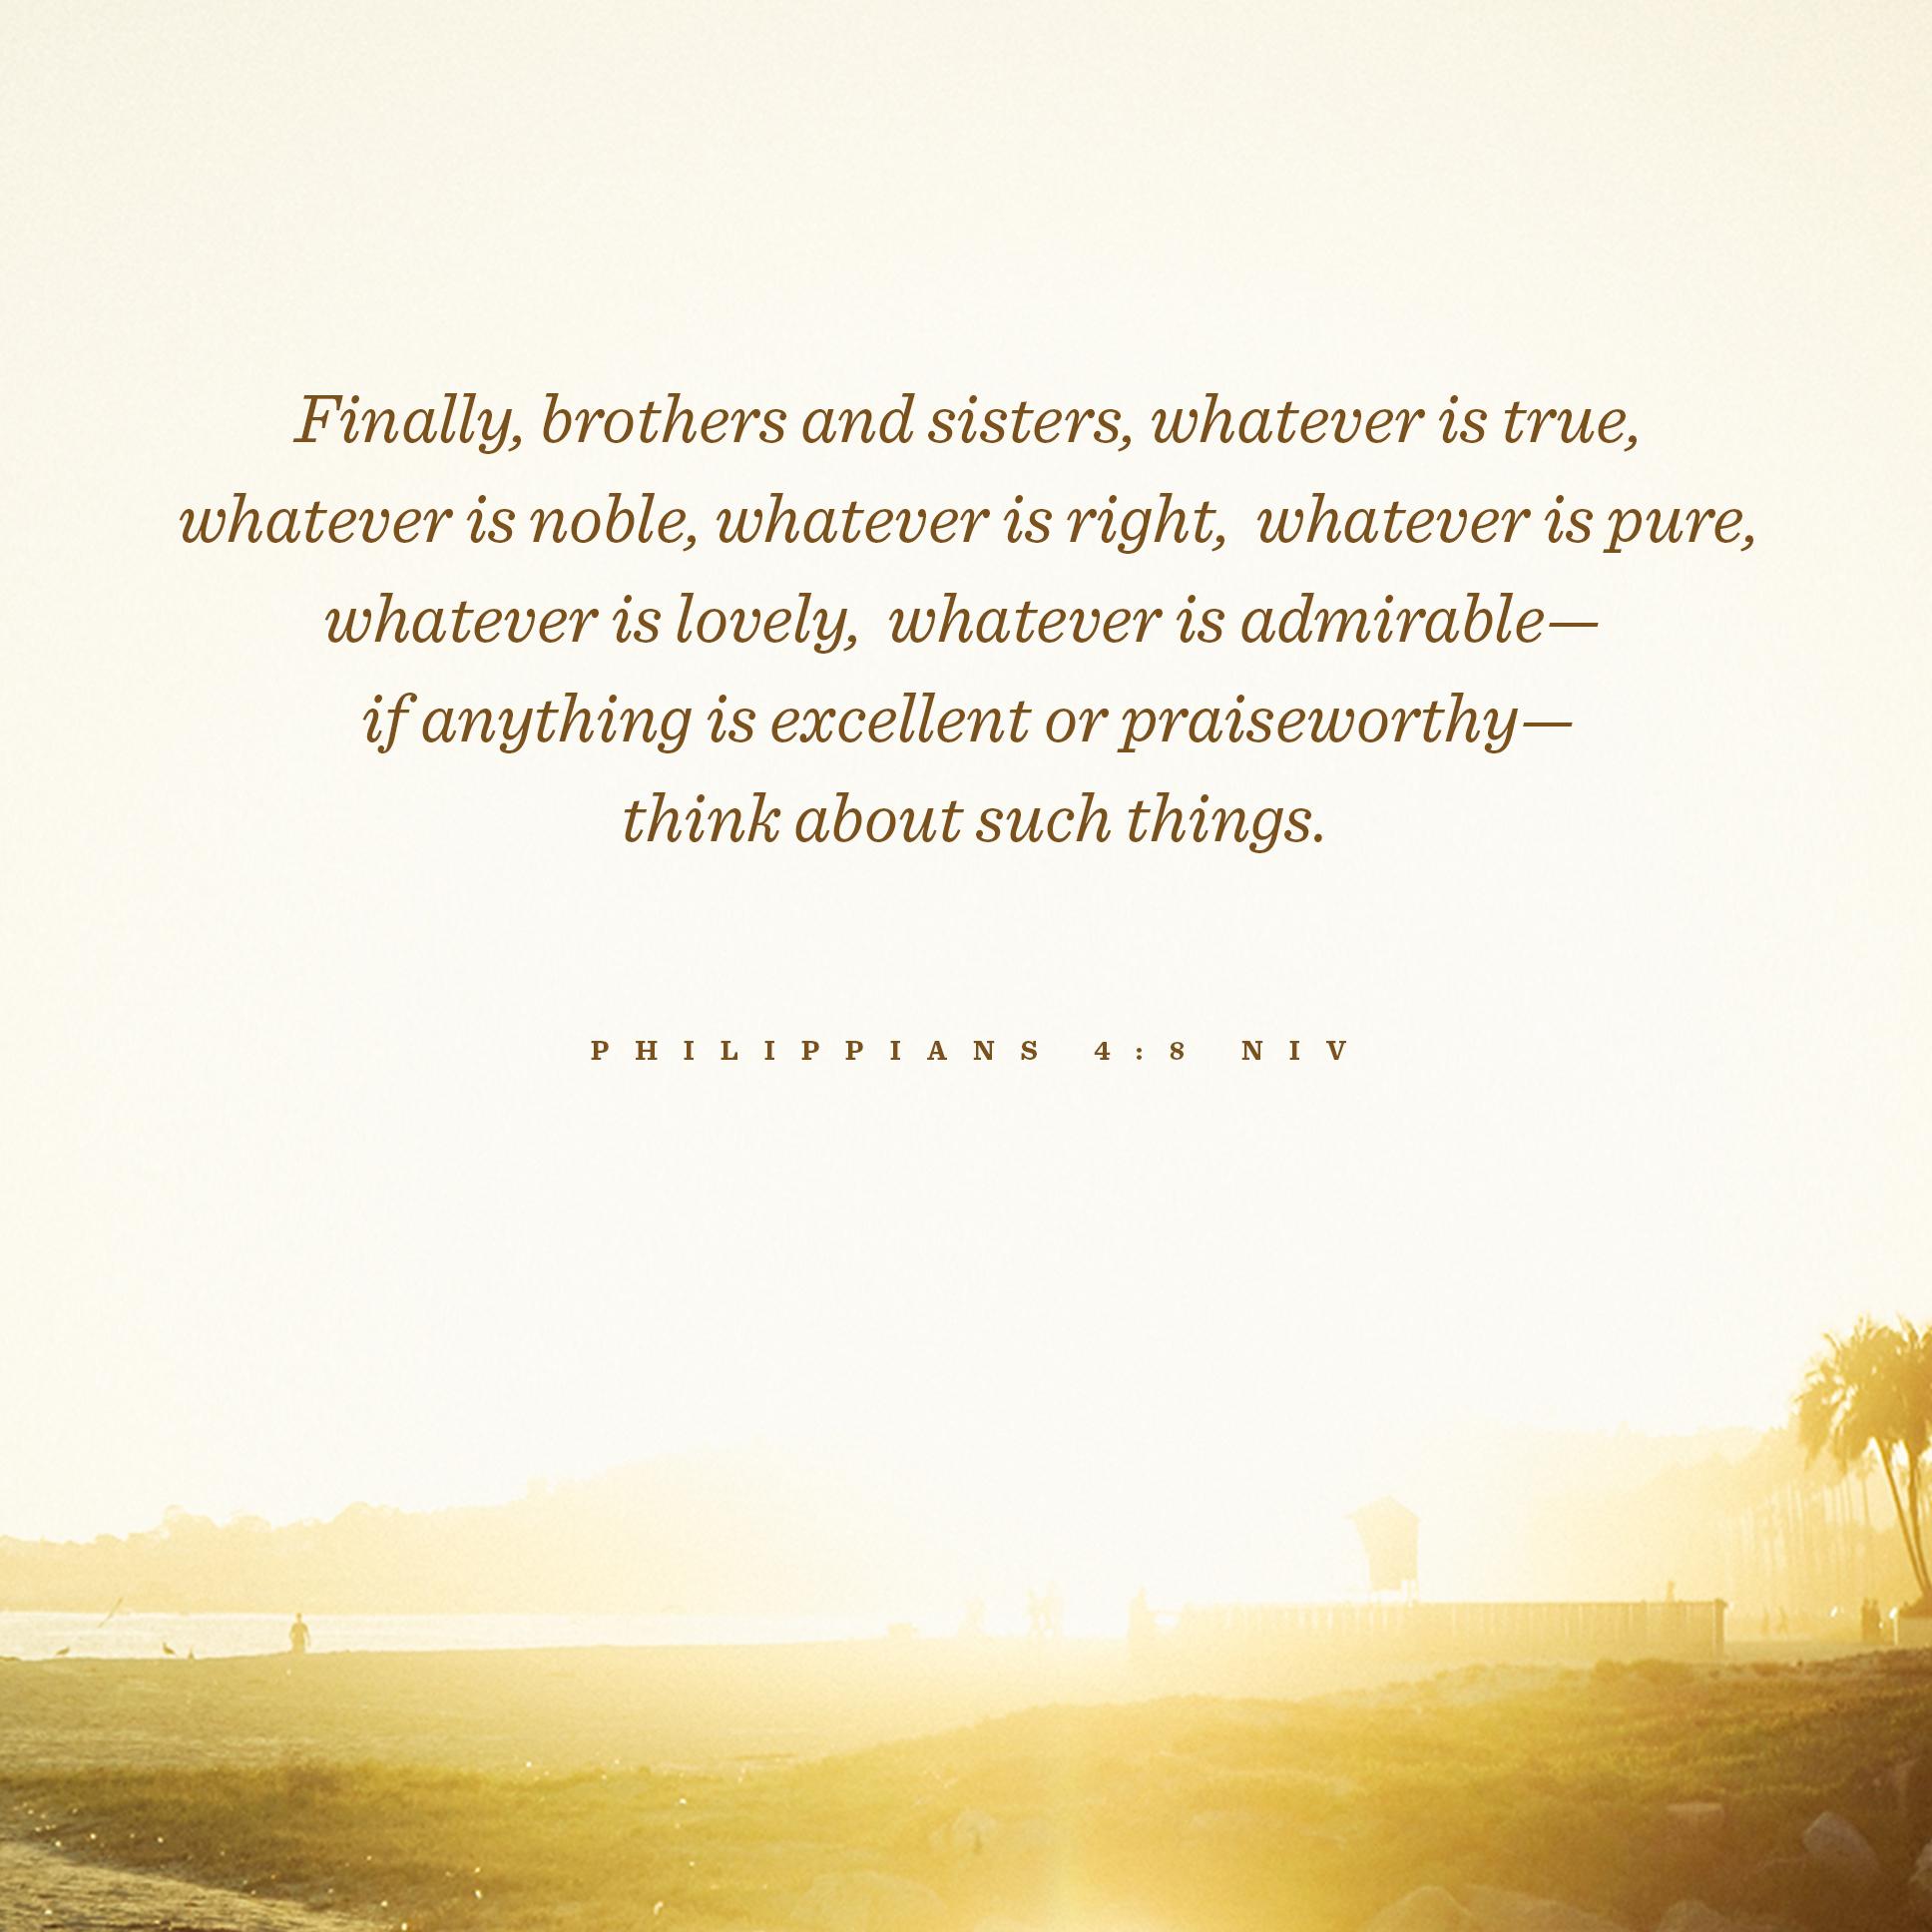 Philippians 4:8 NIV